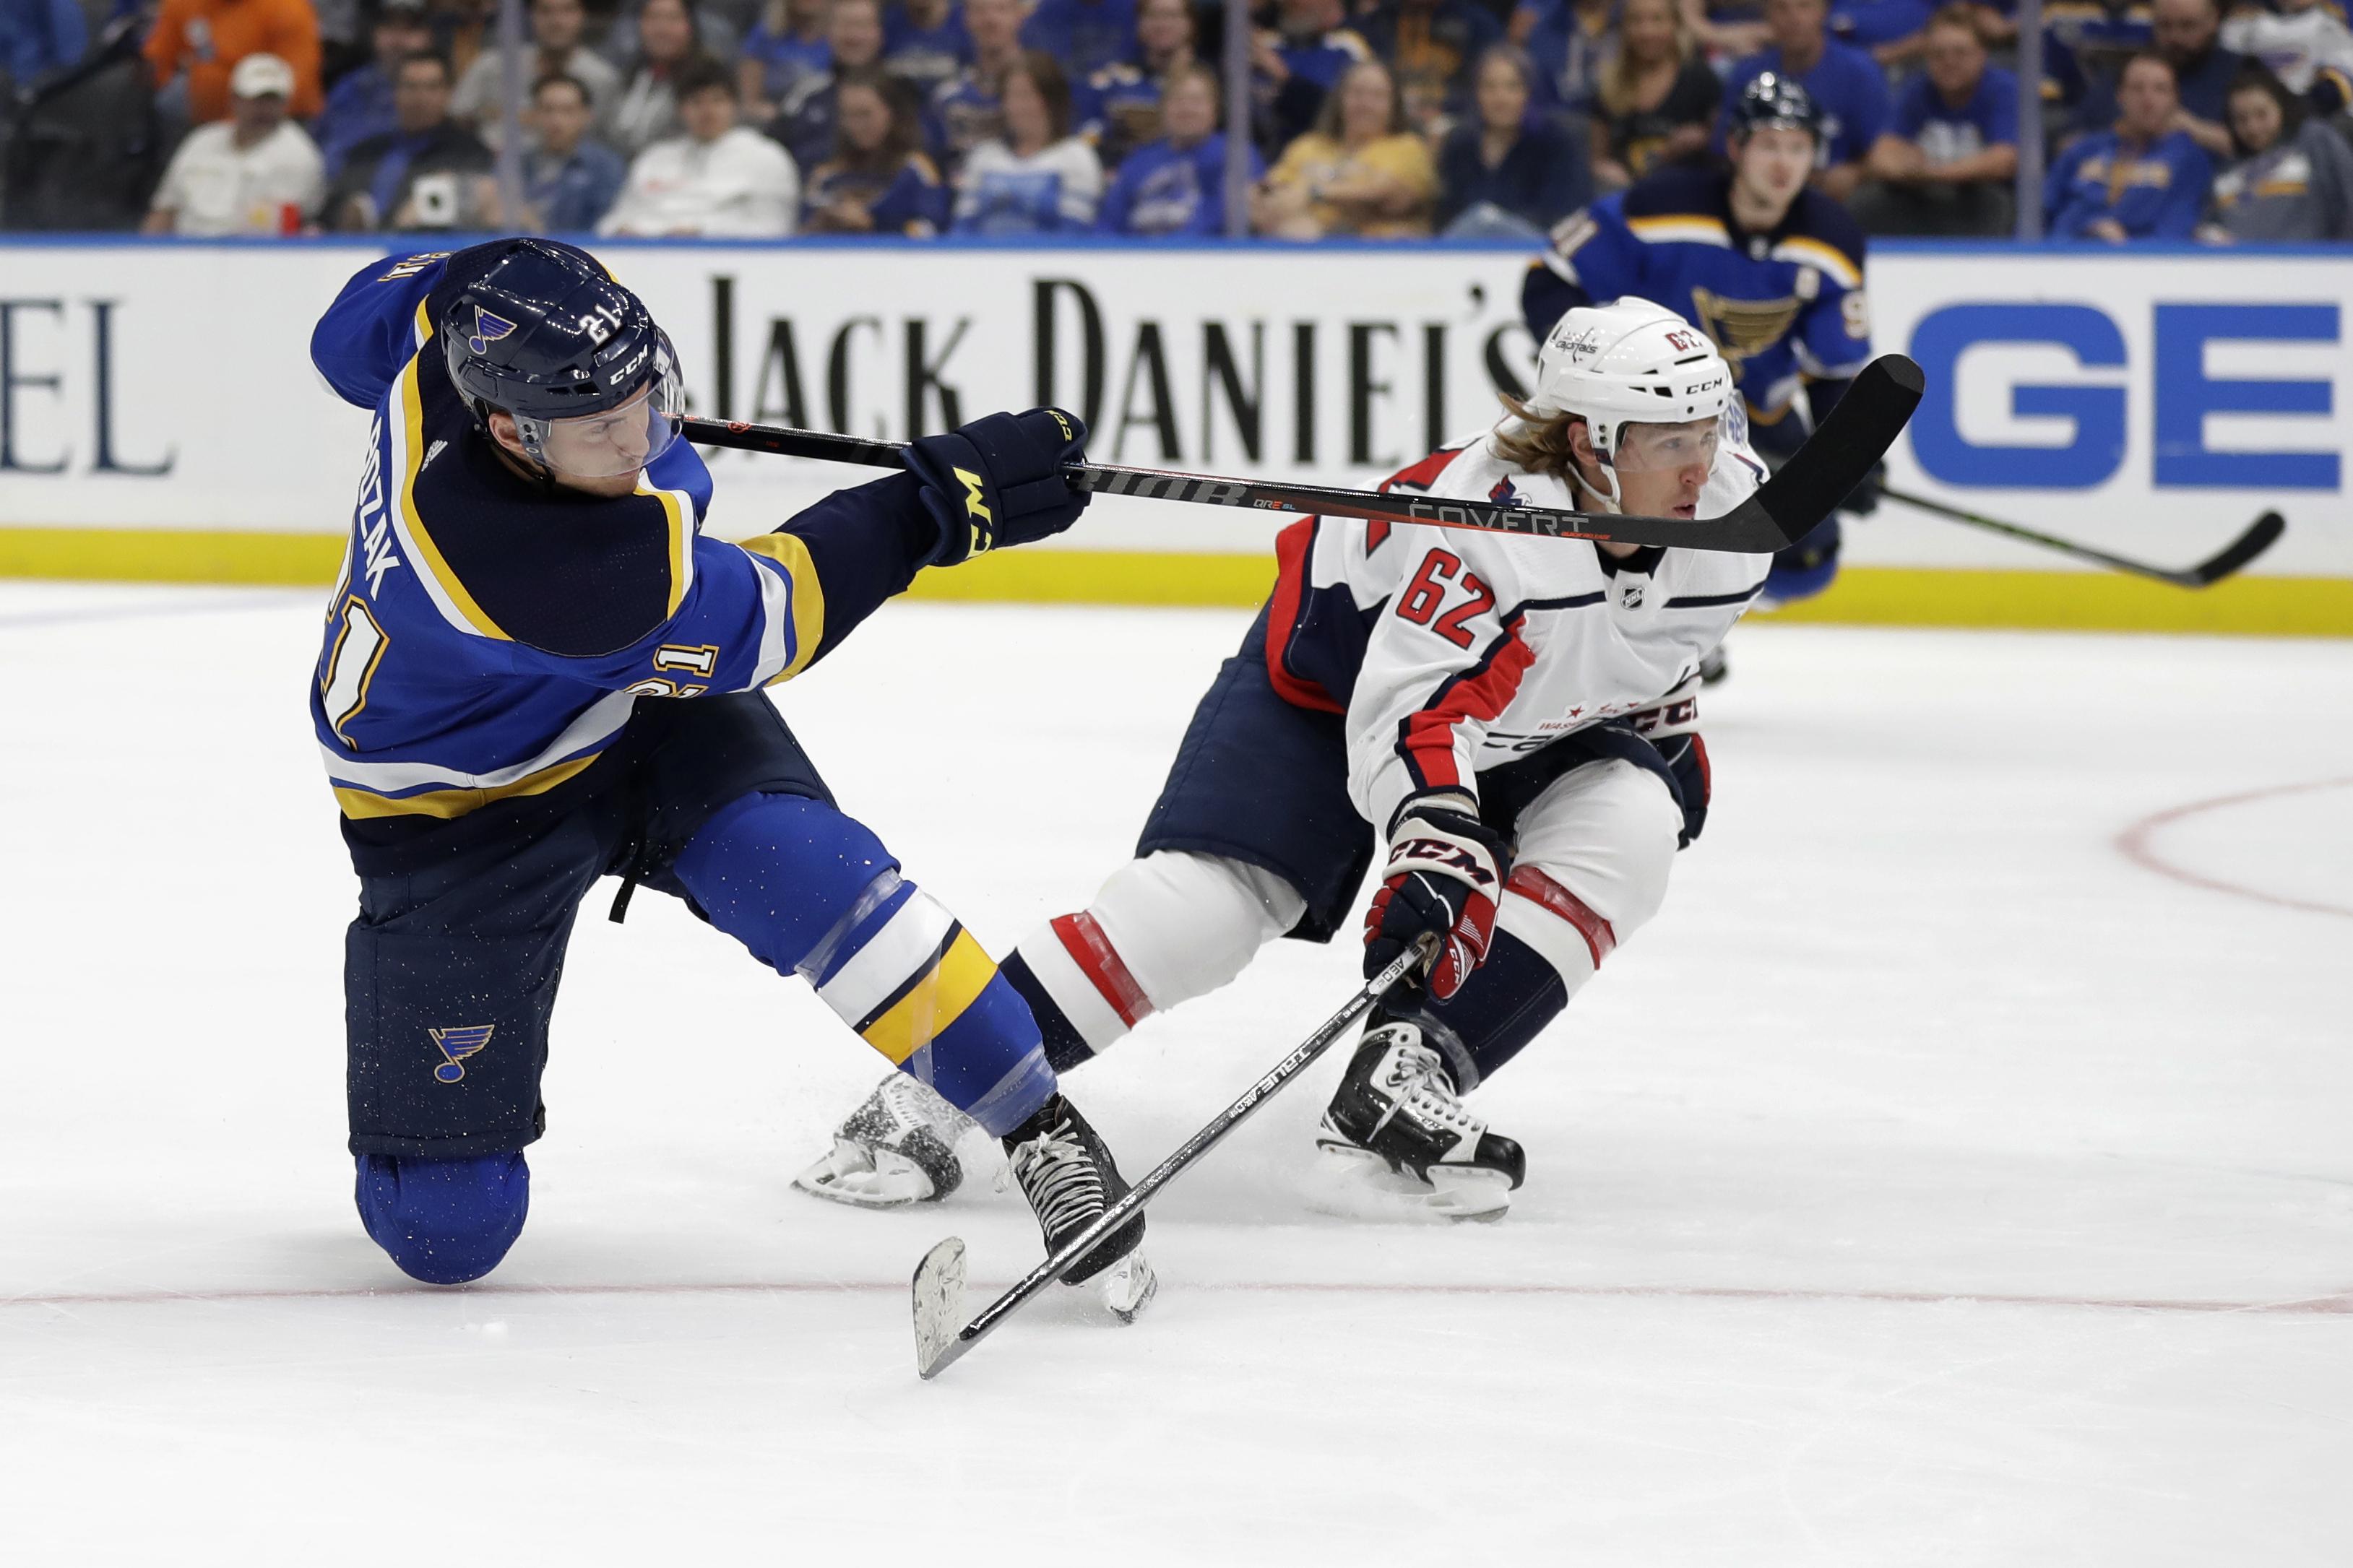 Schwartz sparks Blues in comeback win over Capitals